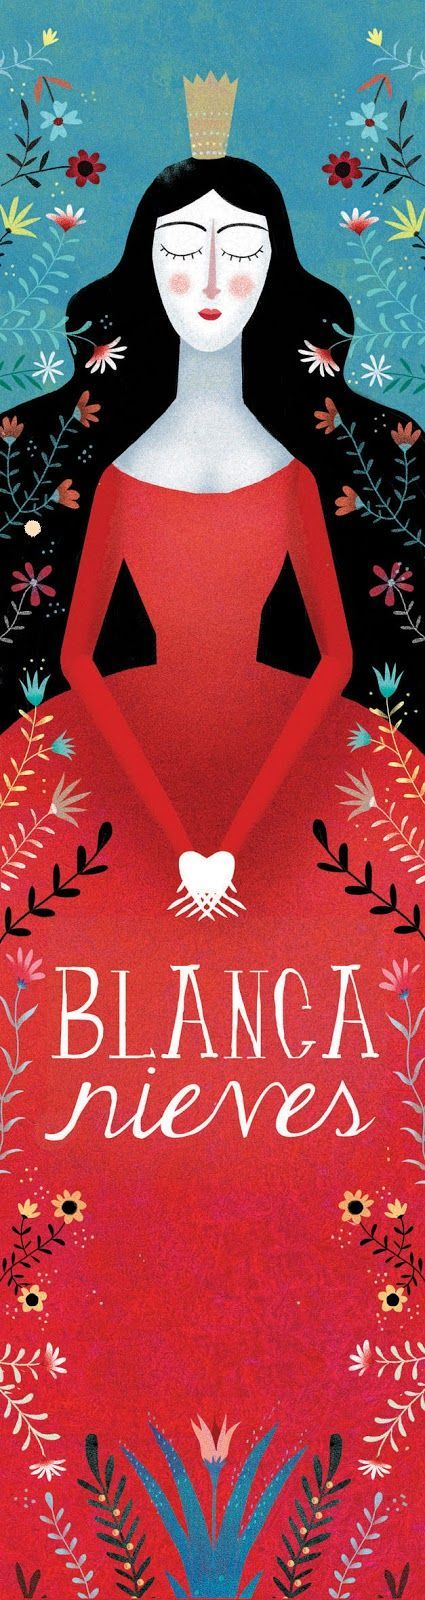 Mariana Ruiz Johnson Illustrations: